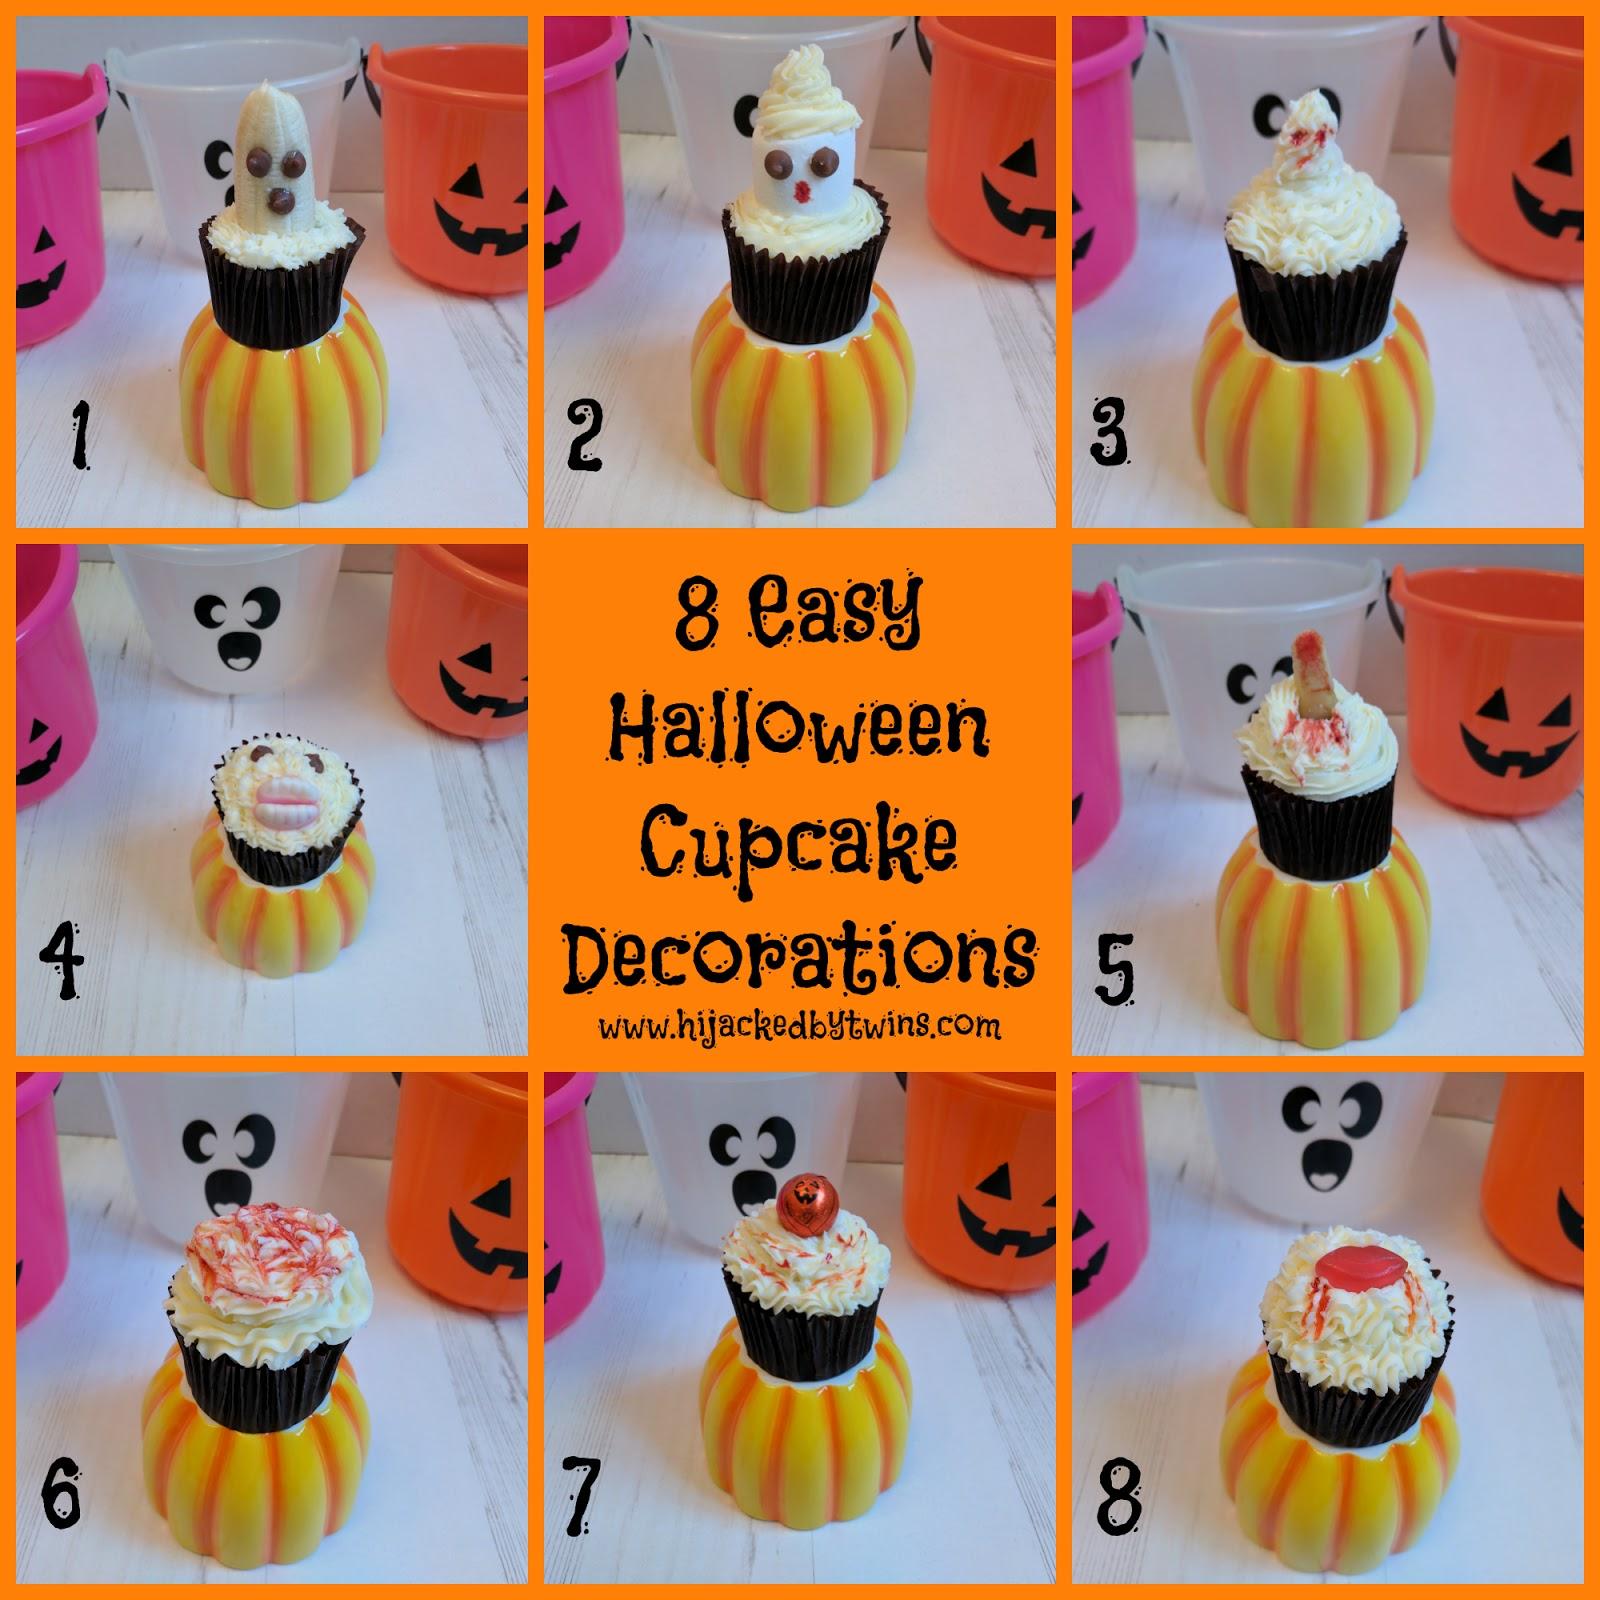 Halloween Cupcake Decoration : Hijacked By Twins: 8 Easy Halloween Cupcake Decoration